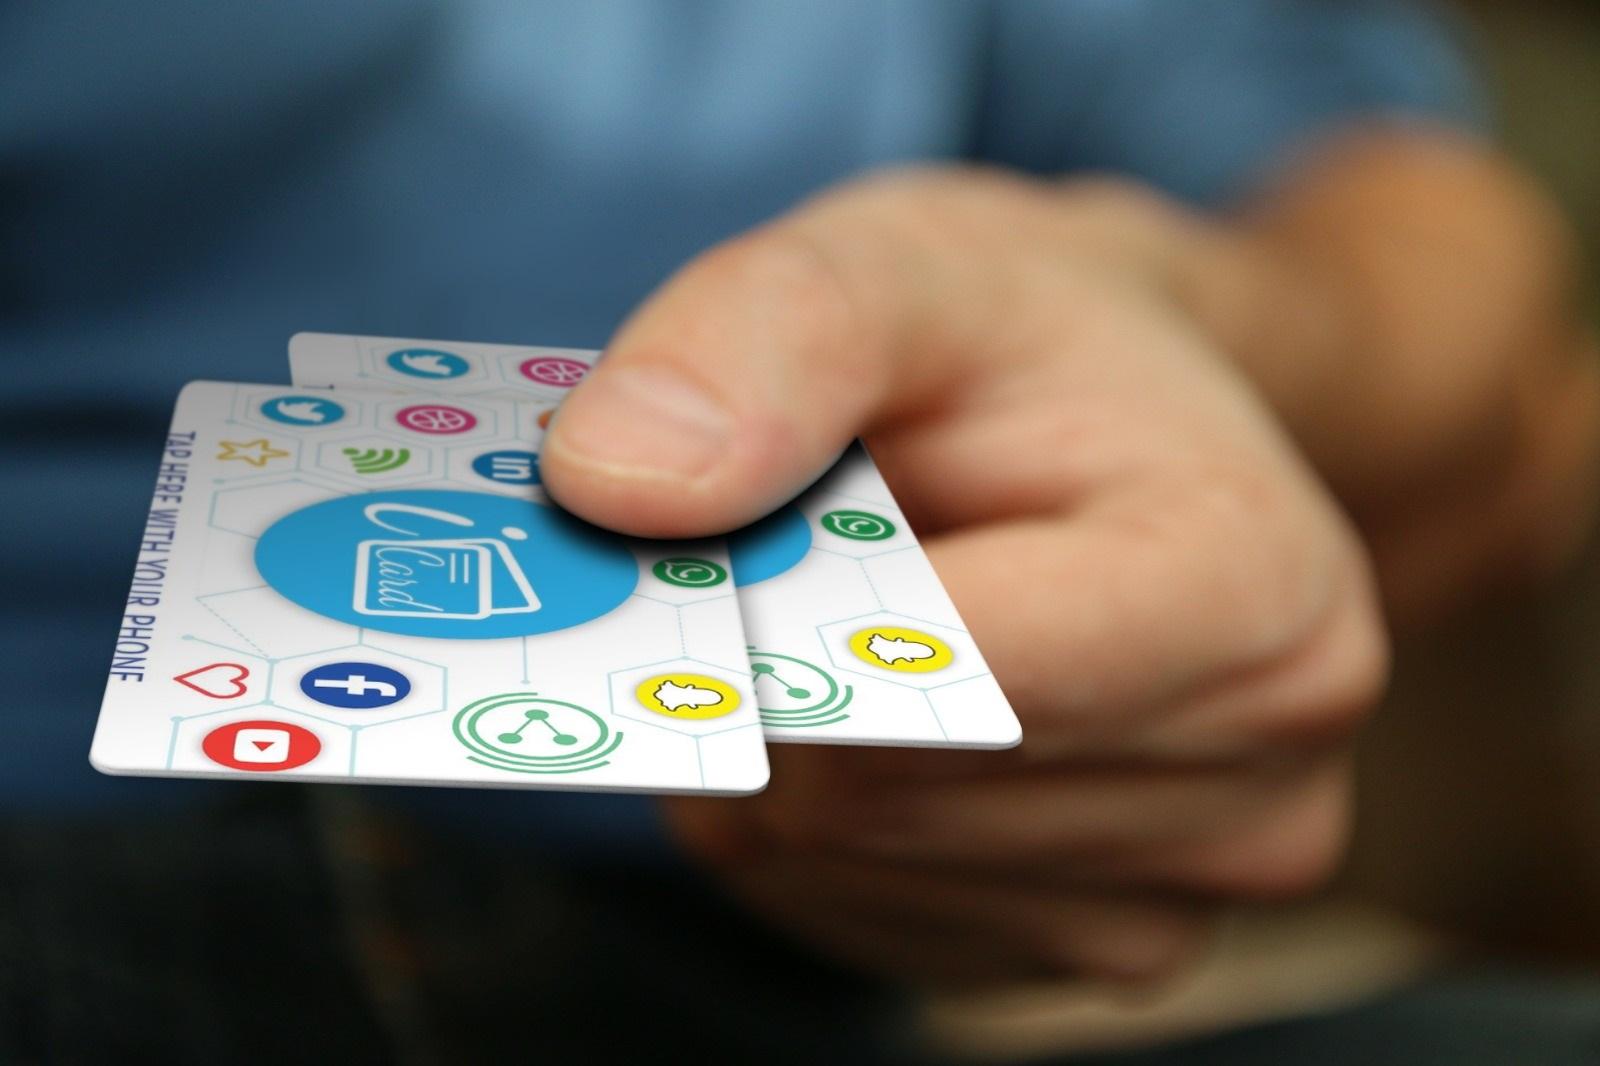 Icard Smart Cards